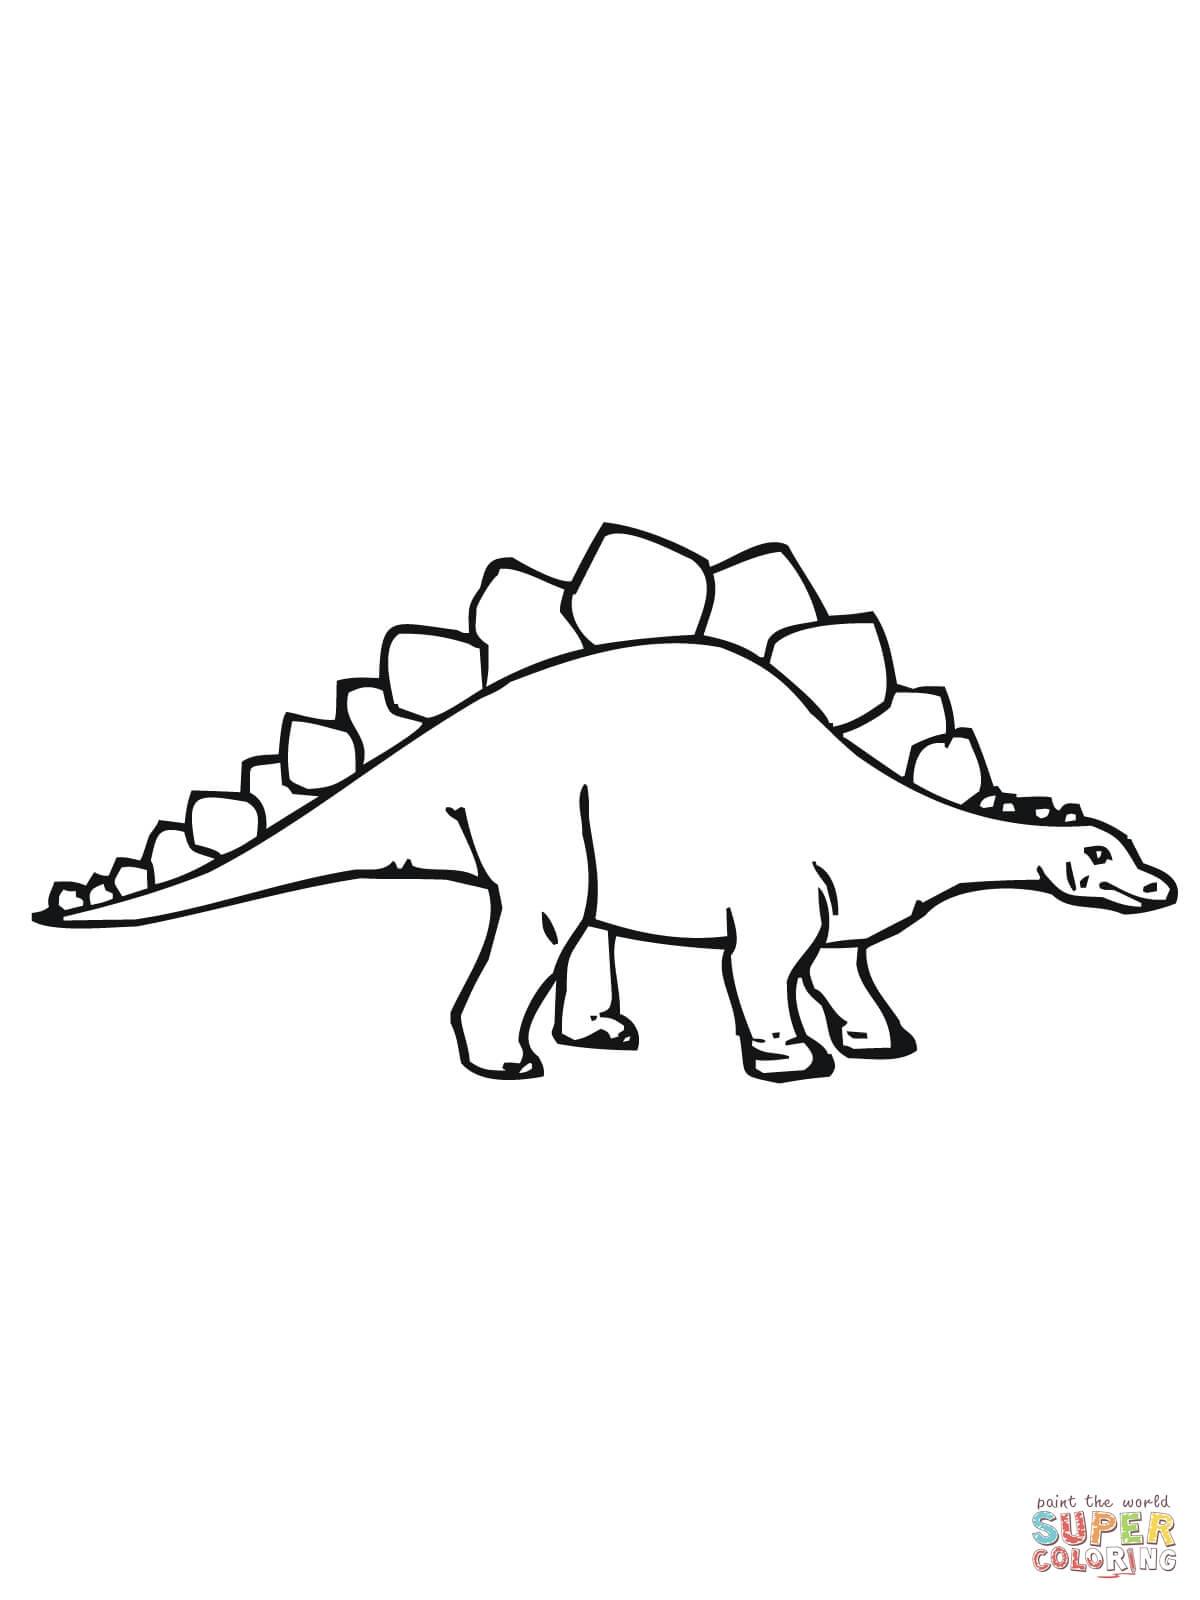 1200x1600 Stegosaurus Coloring Page Inspirational Printable Stegosaurus